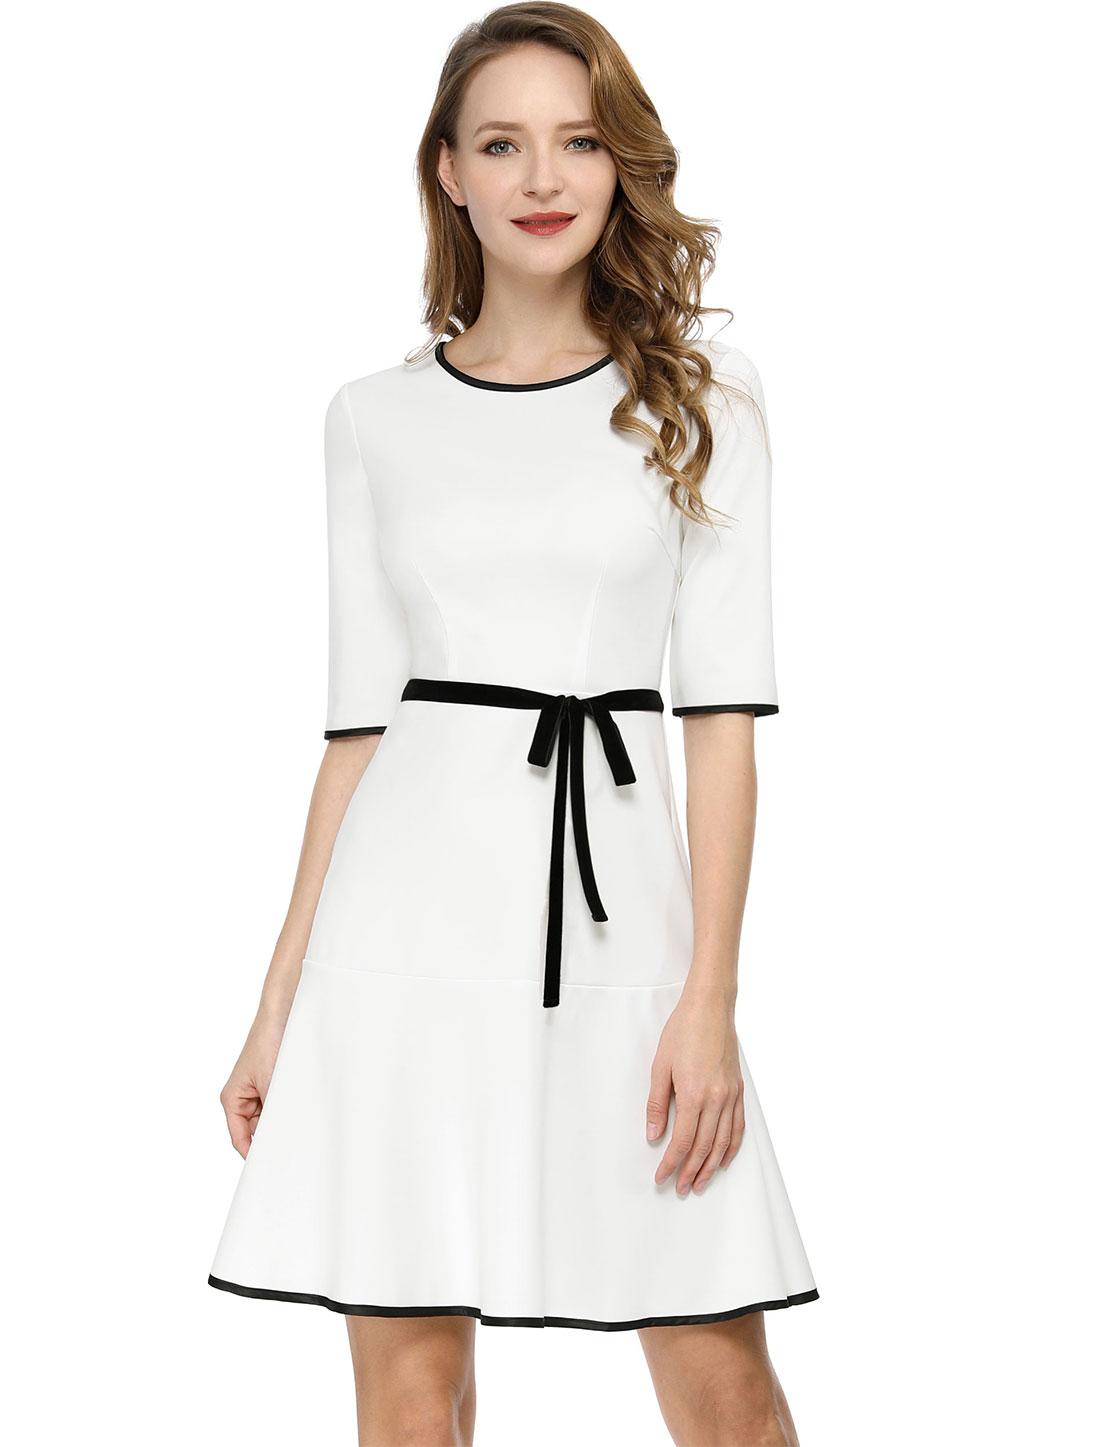 Women's Half Sleeve Contrast Trim Ruffled Hem A-line Dress White XS (US 2)